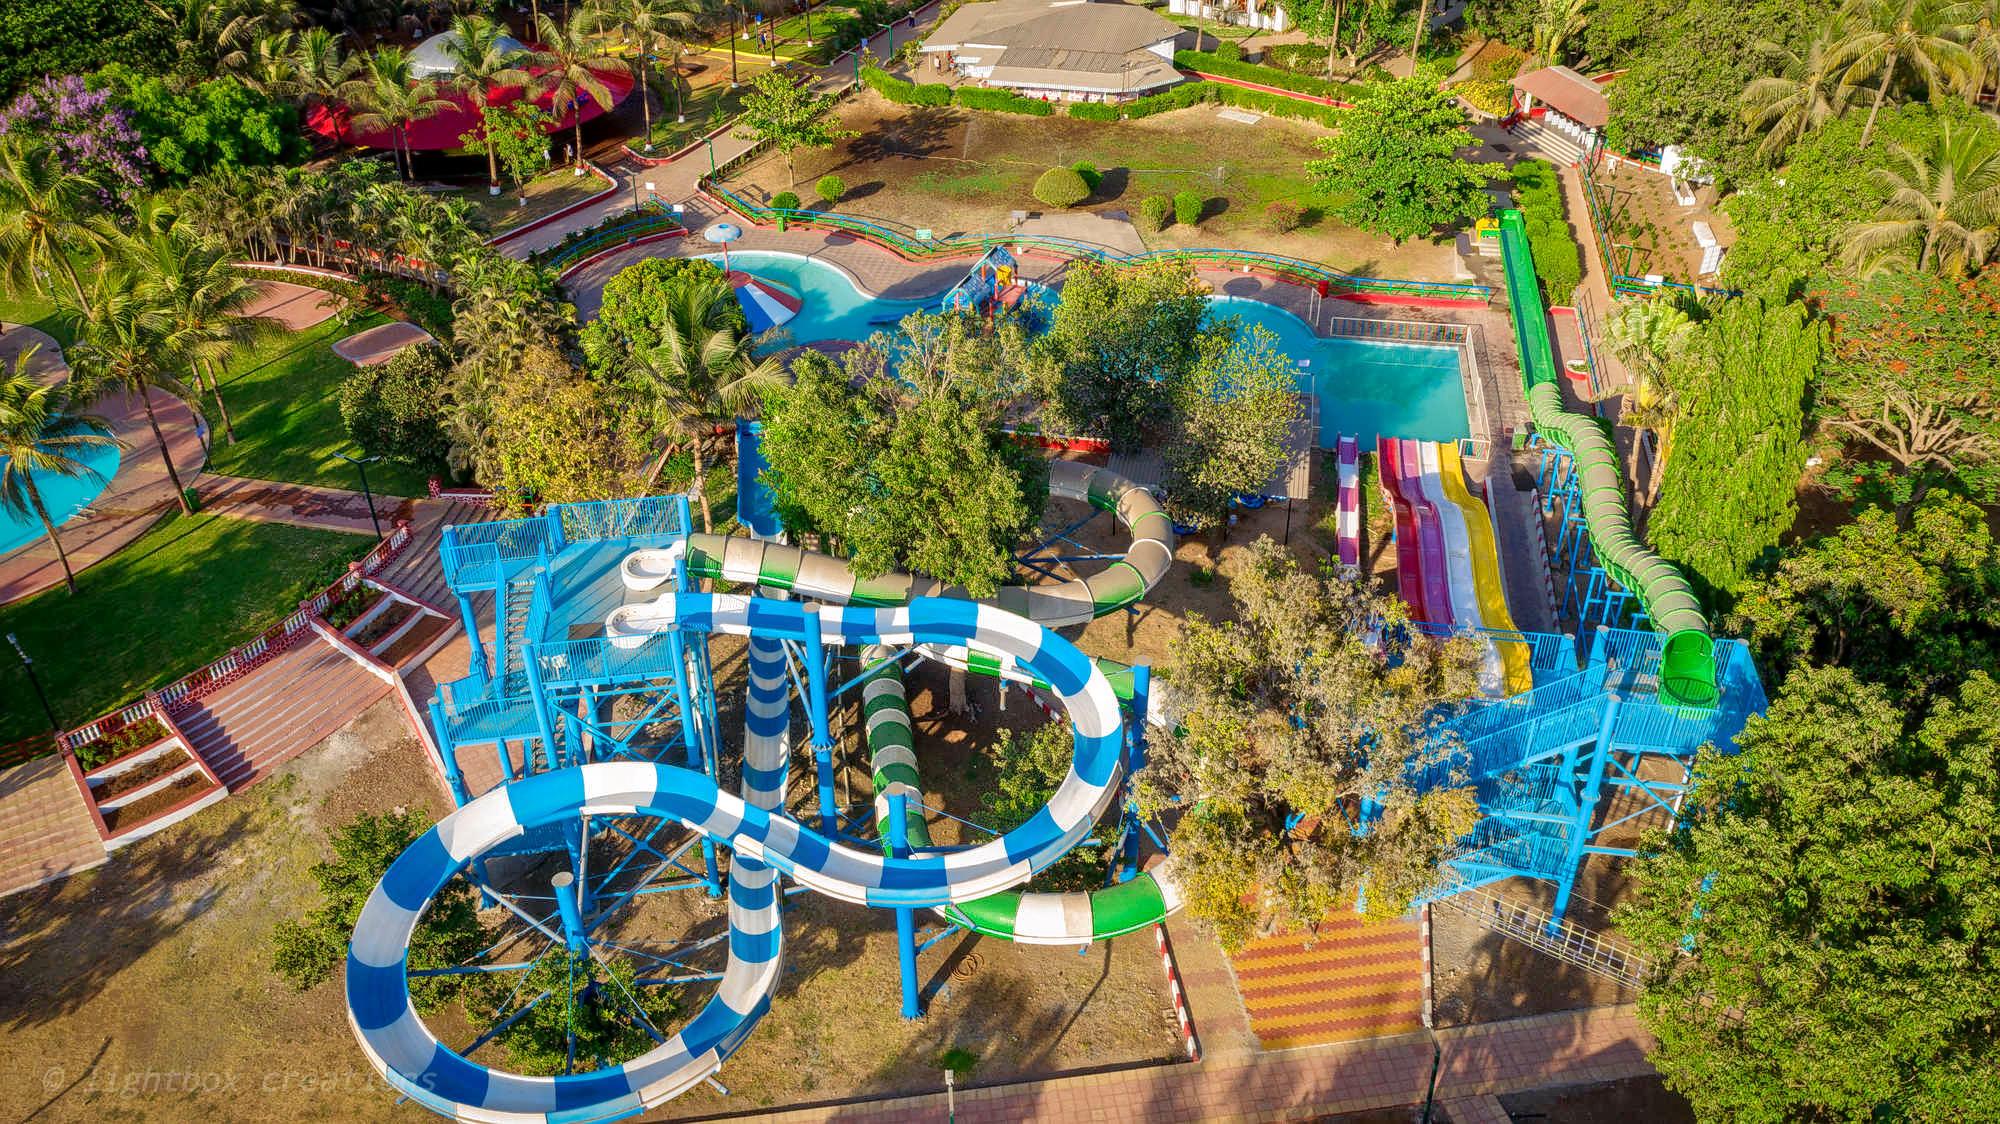 1588224799_visava-amusement-park-and-resort-new-panvel-navi-mumbai-resorts-ykbvuic4hq.jpg